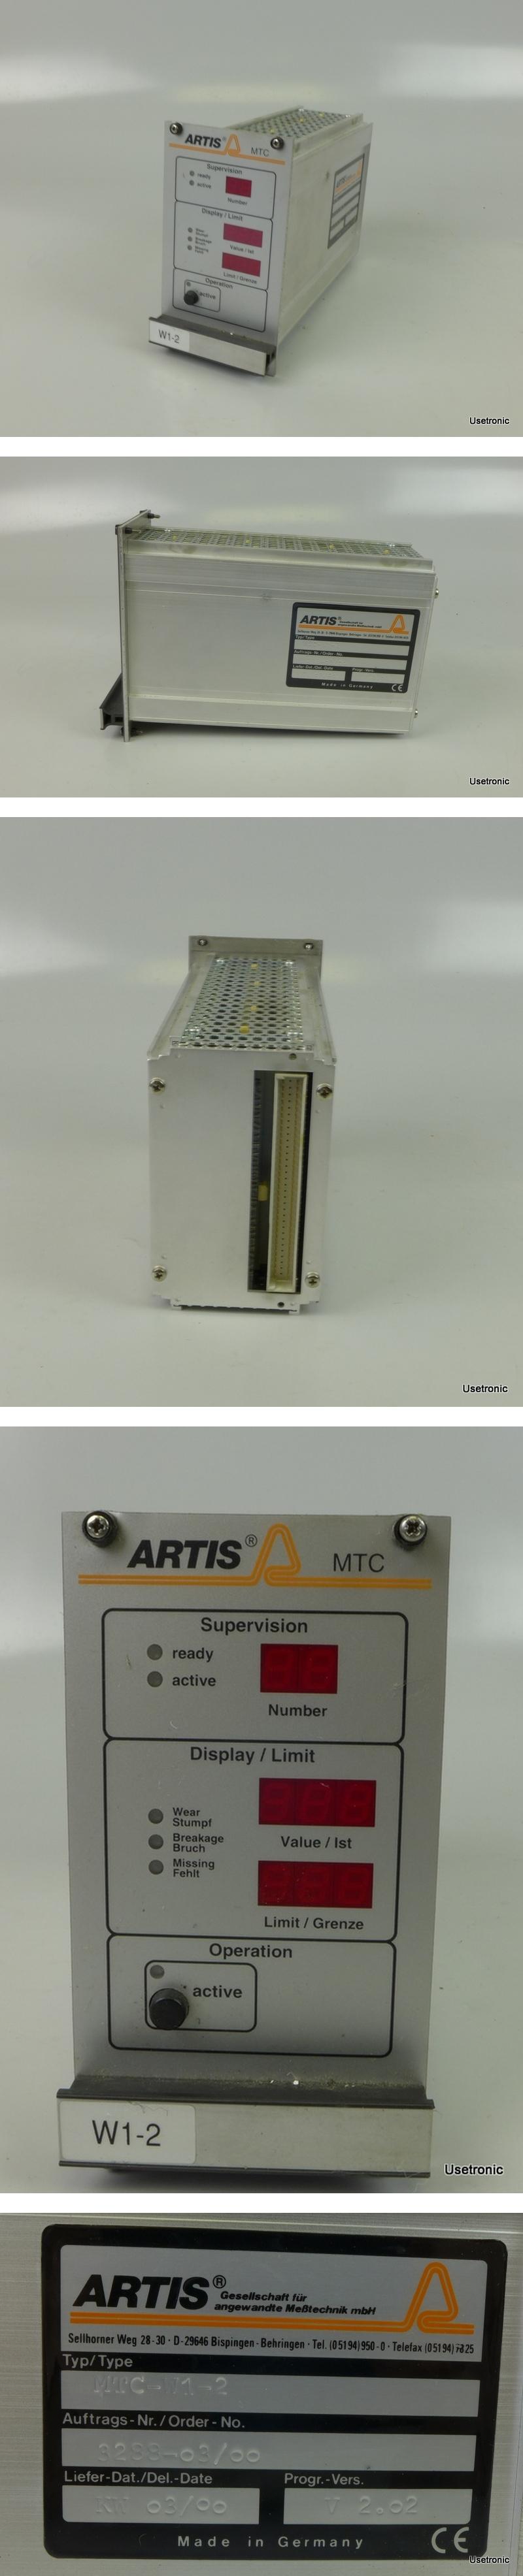 Artis MTC-W1-2